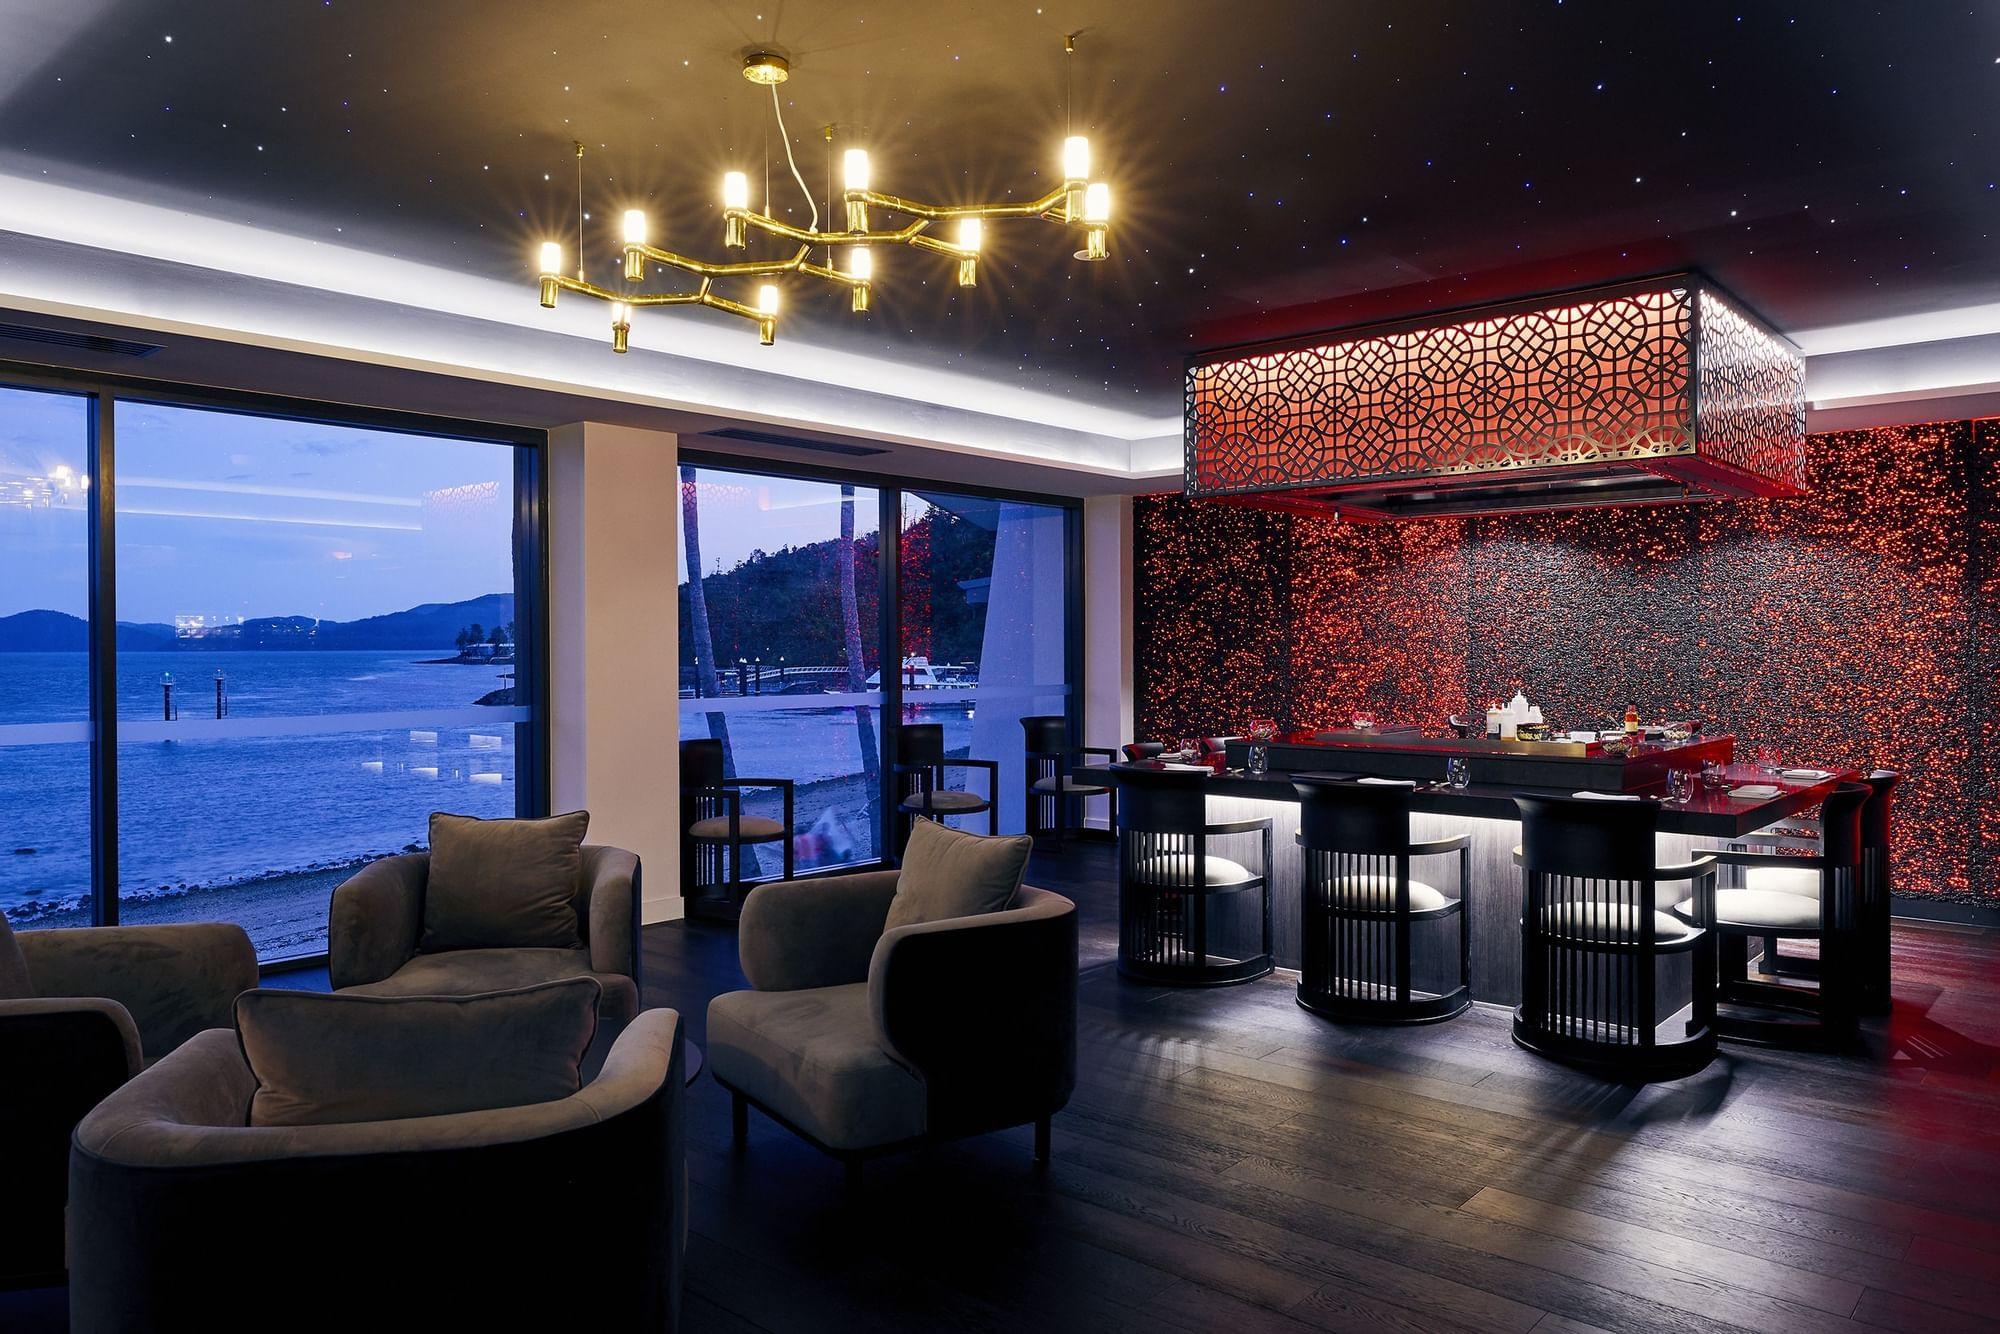 Bar area in Infinity Restaurant at Daydream Island Resort